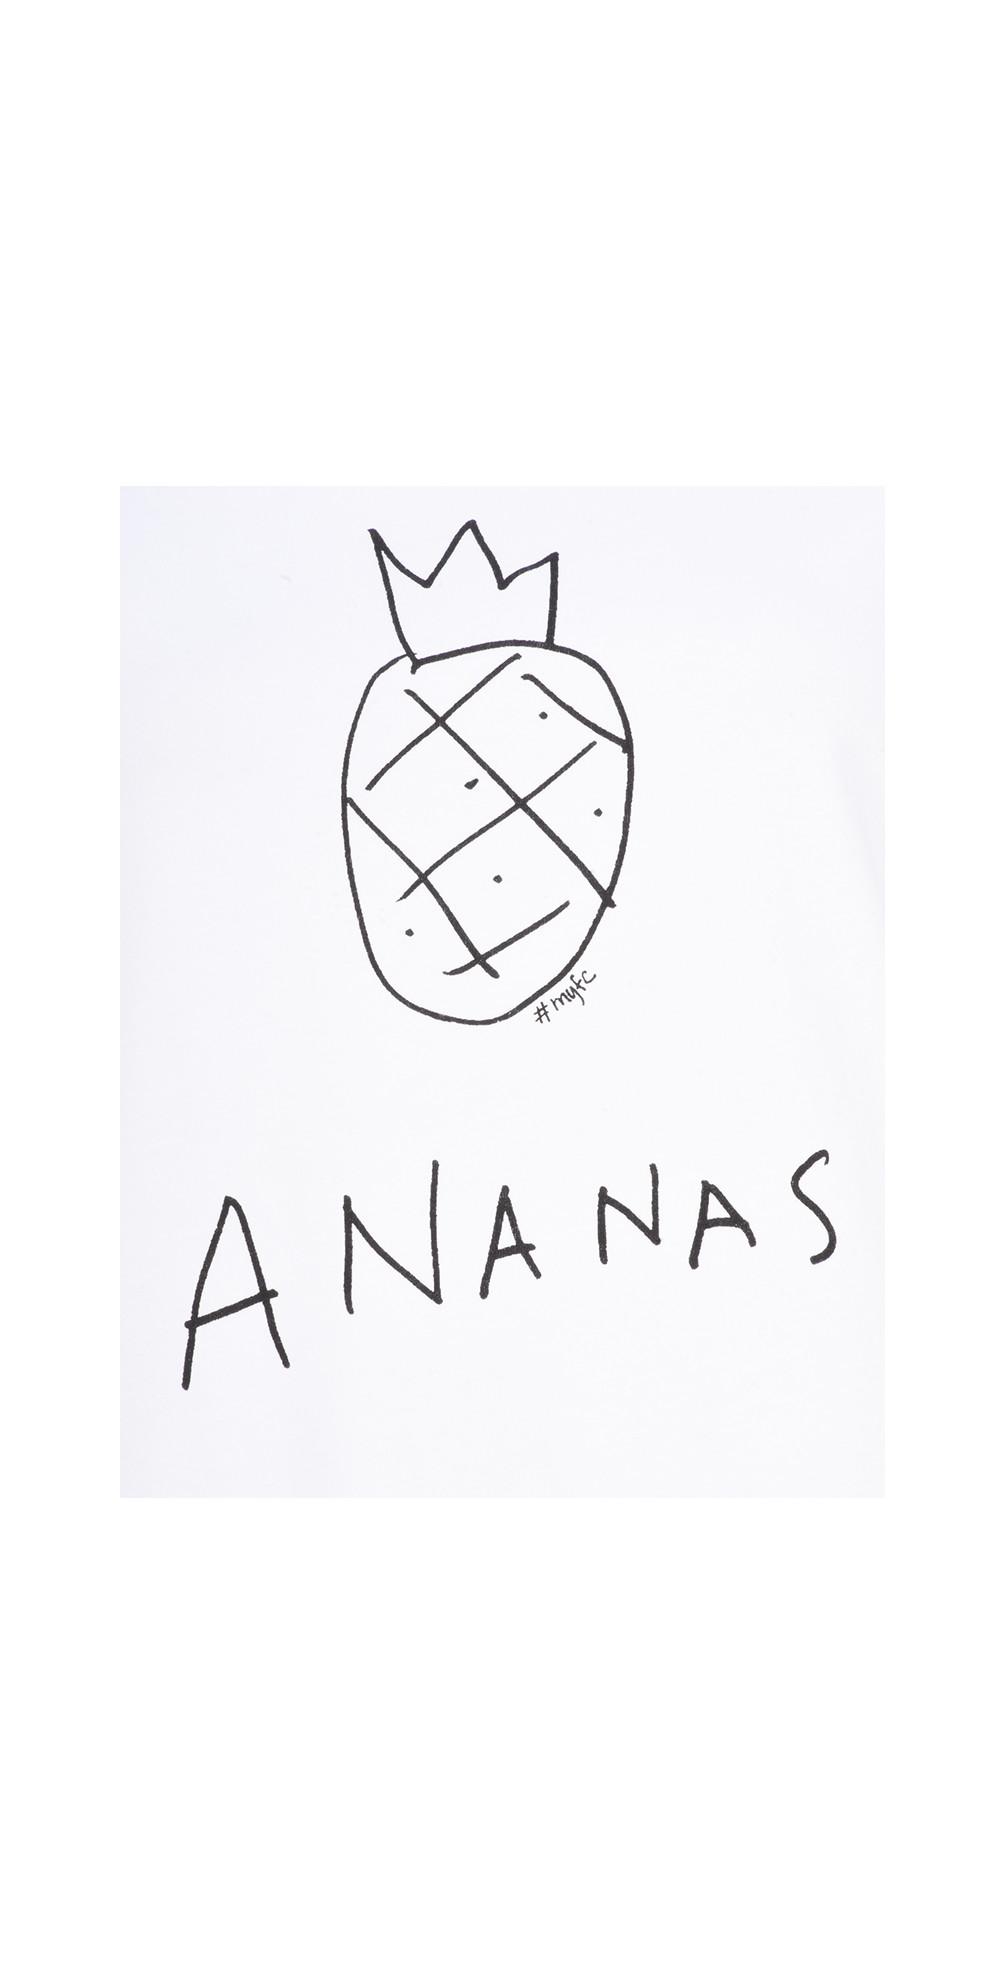 Ananas Tee Top main image